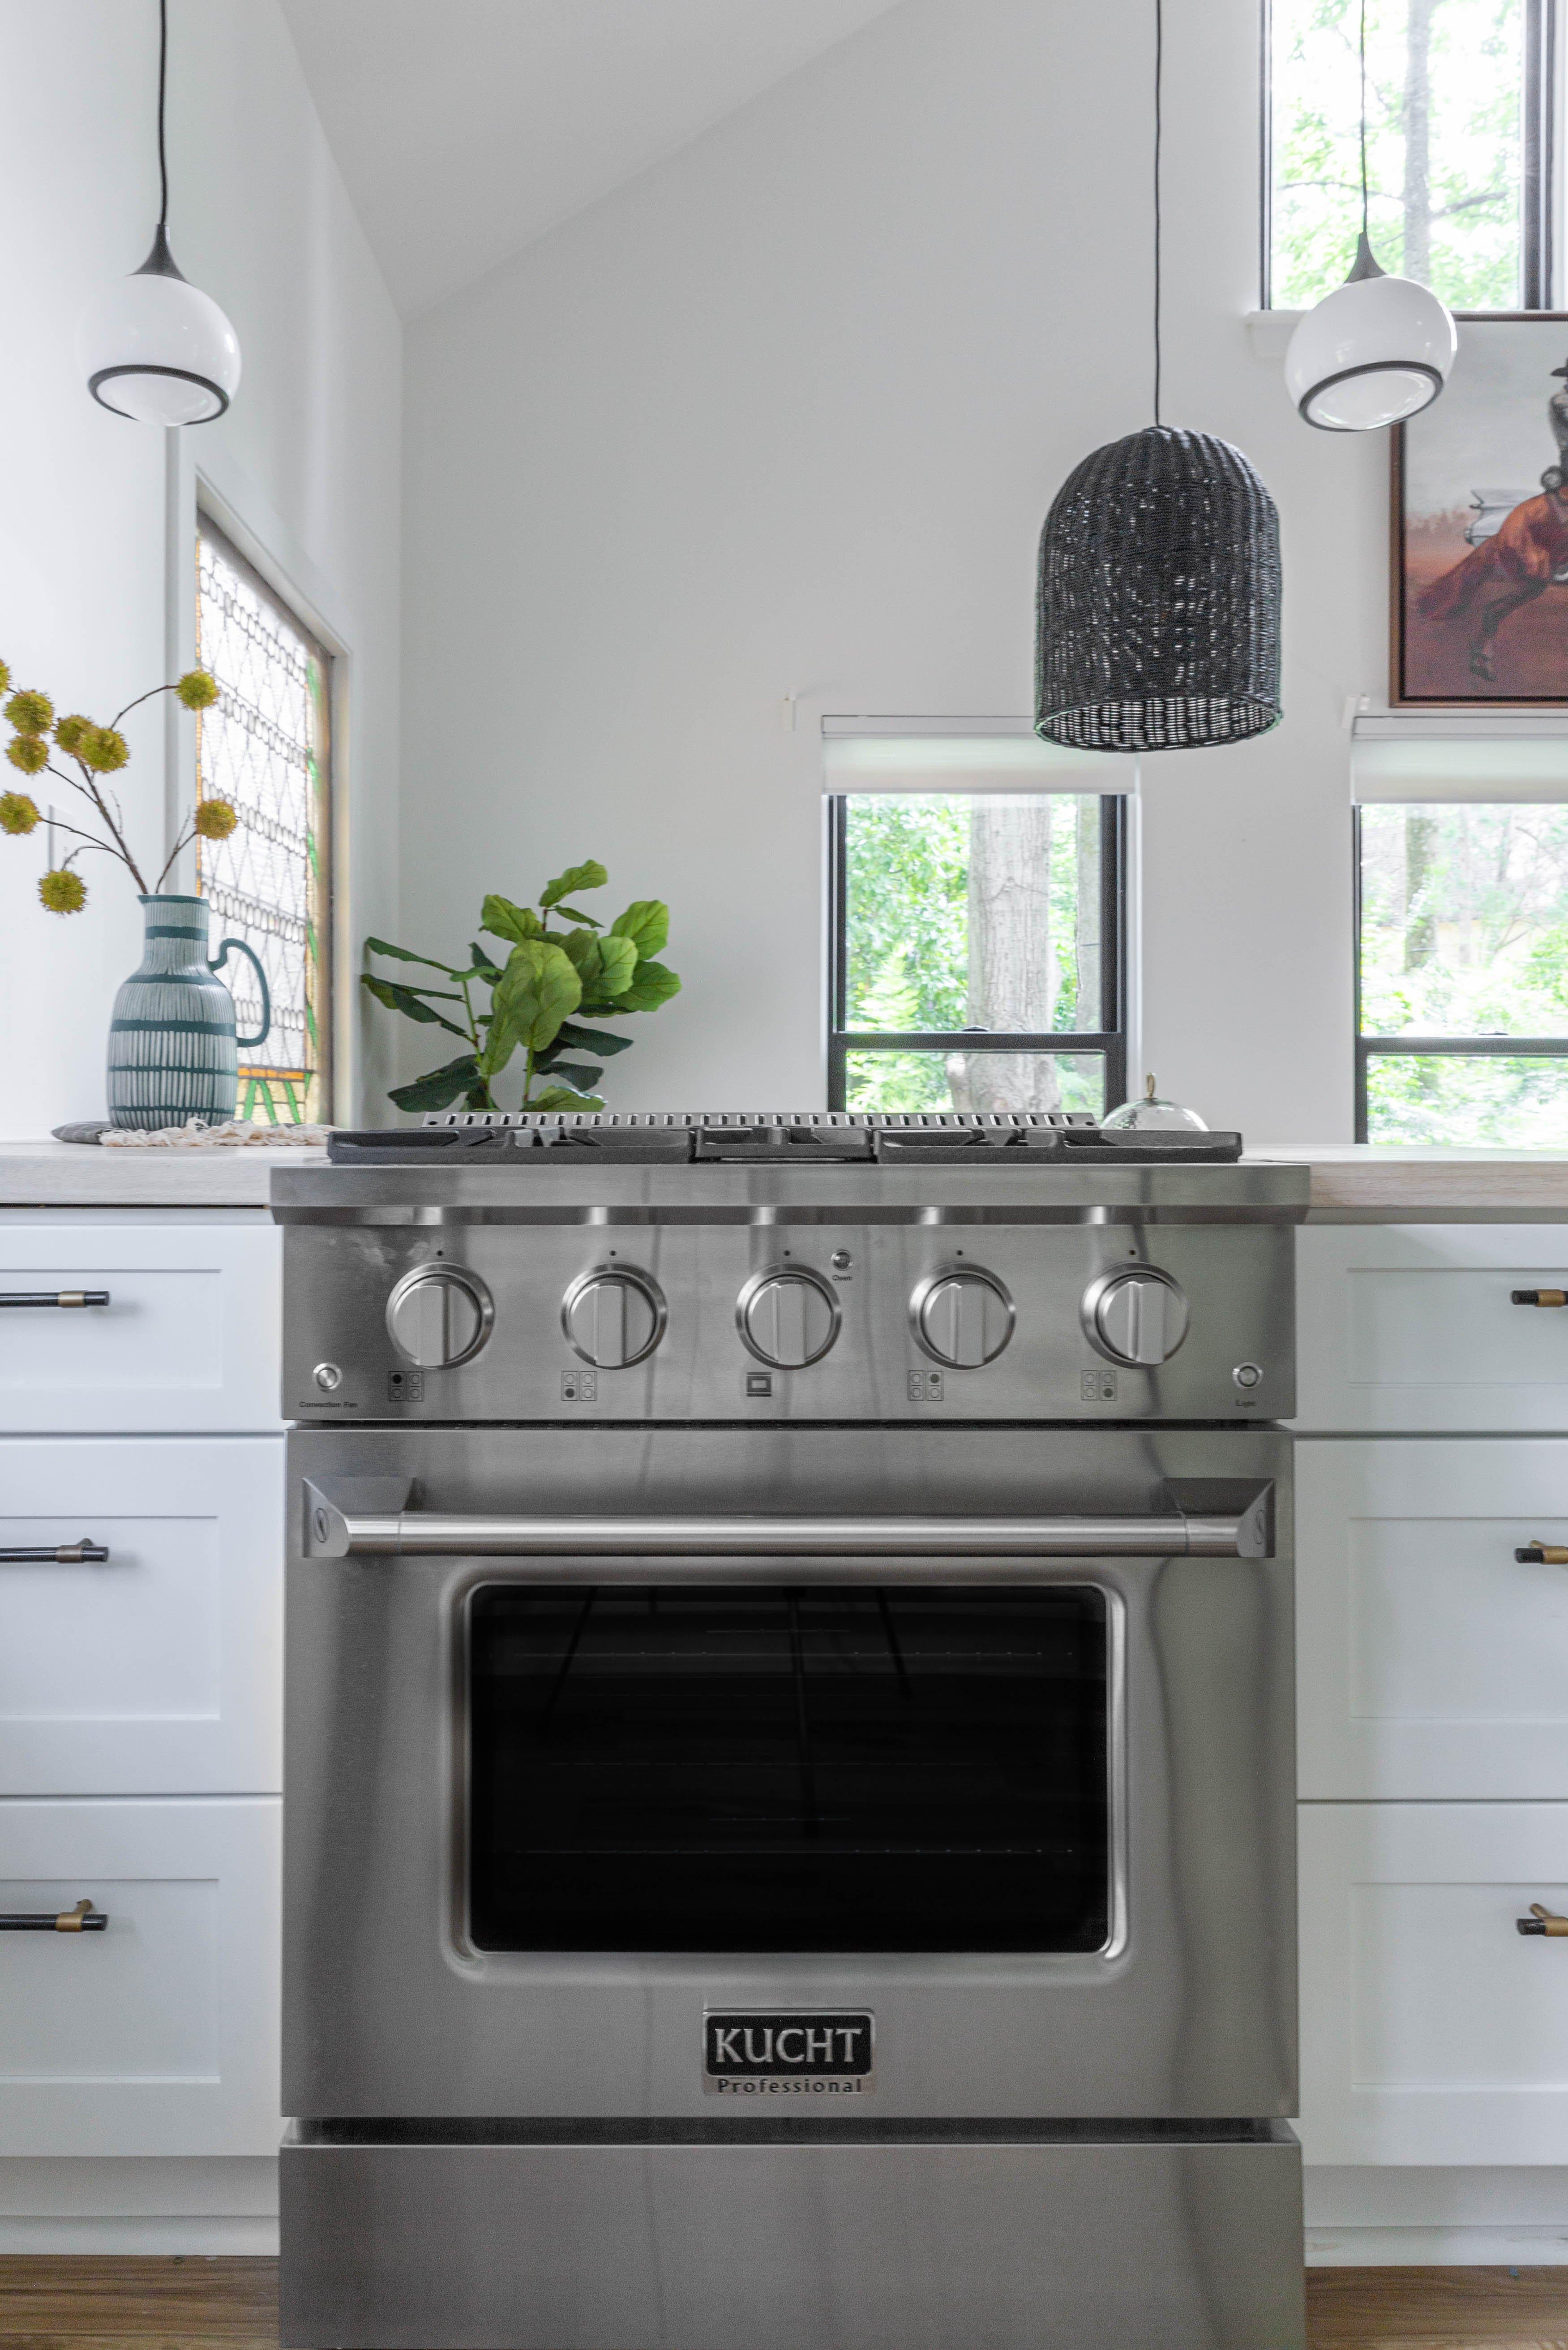 06 kitchen 20210627-IMG_7603.jpg